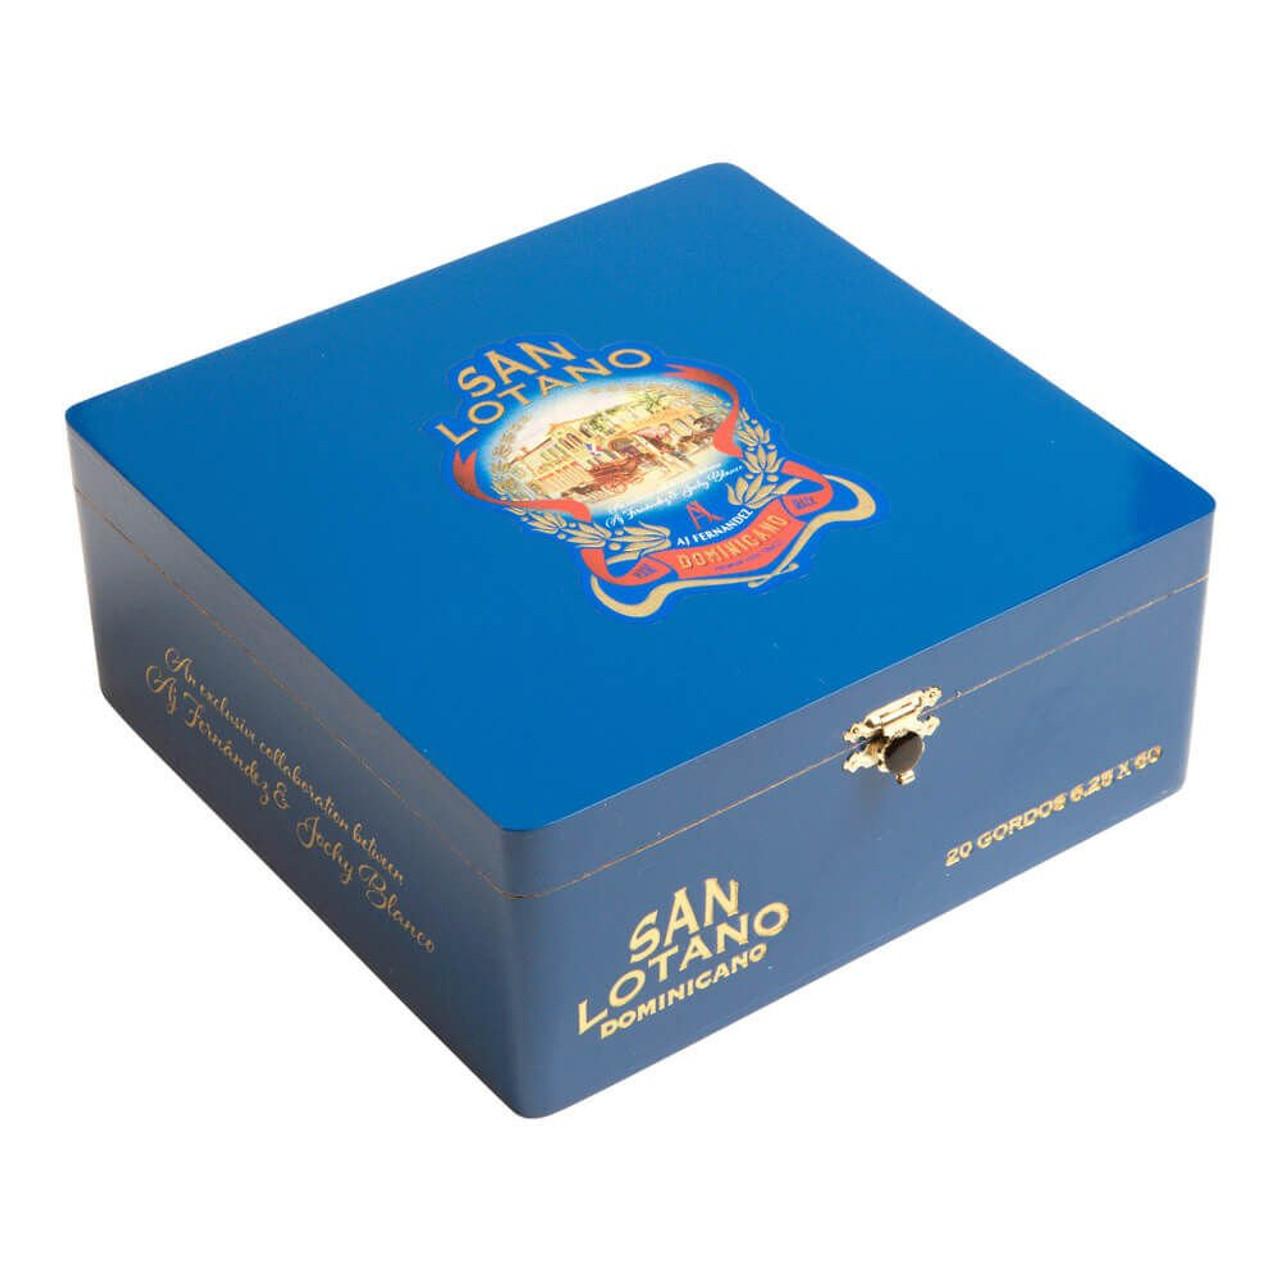 AJ Fernandez San Lotano Dominicano Robusto Cigars - 5.0 x 50 (Box of 20)